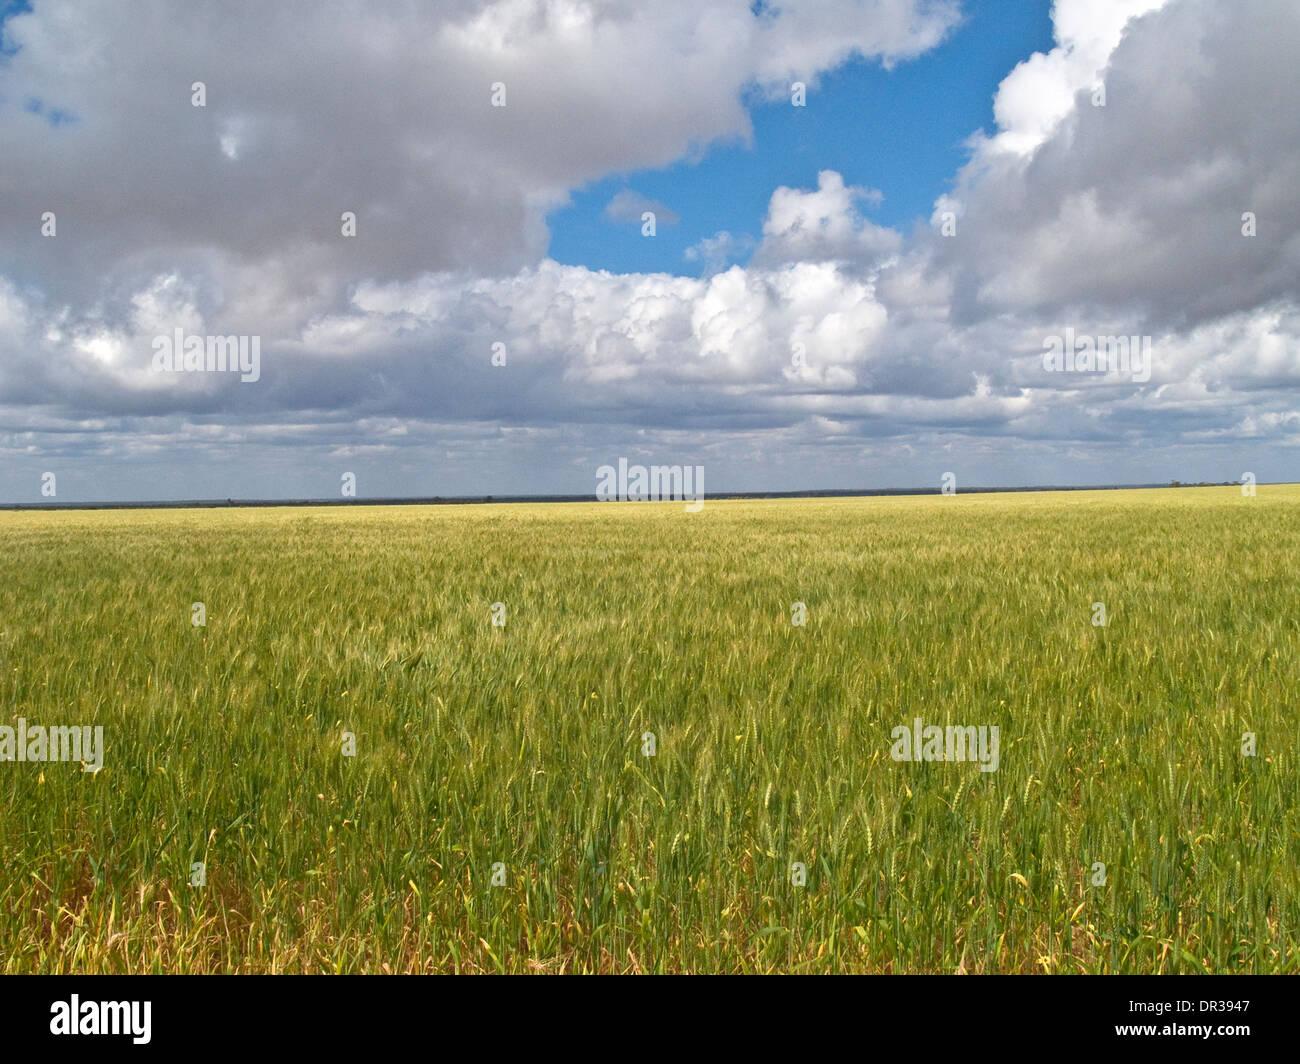 Wheatfield, Western Australia - Stock Image